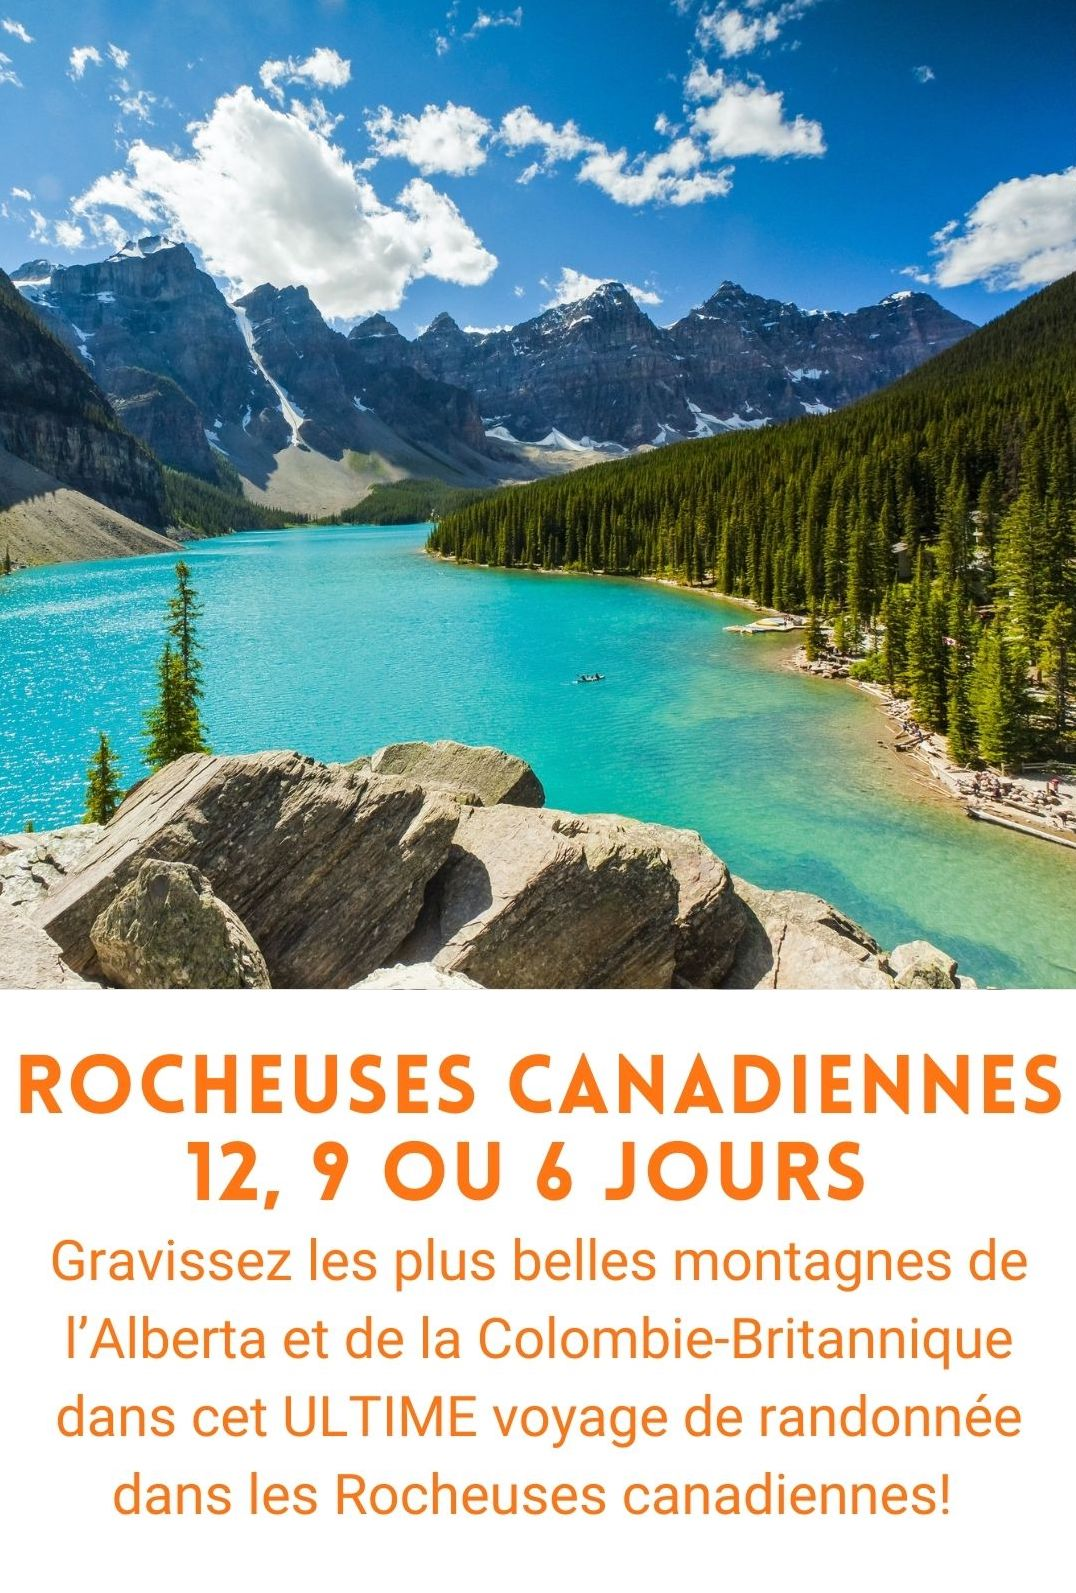 Voyage organisé Rocheuses canadiennes